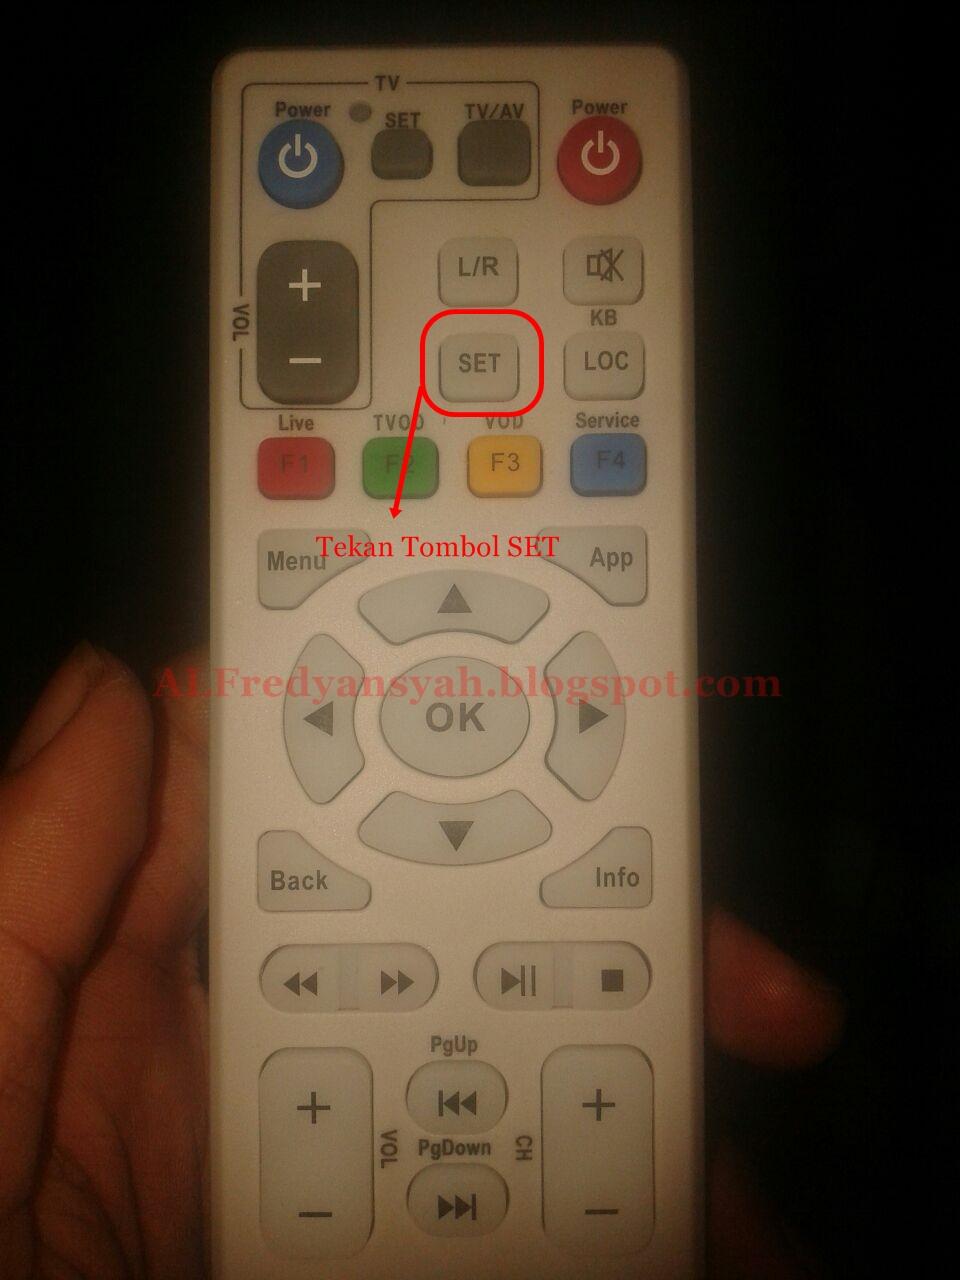 Cara Setting Tv Indihome : setting, indihome, ALFredyansyah:, MENGATASI, ERROR, USeeTV, INDIHOME